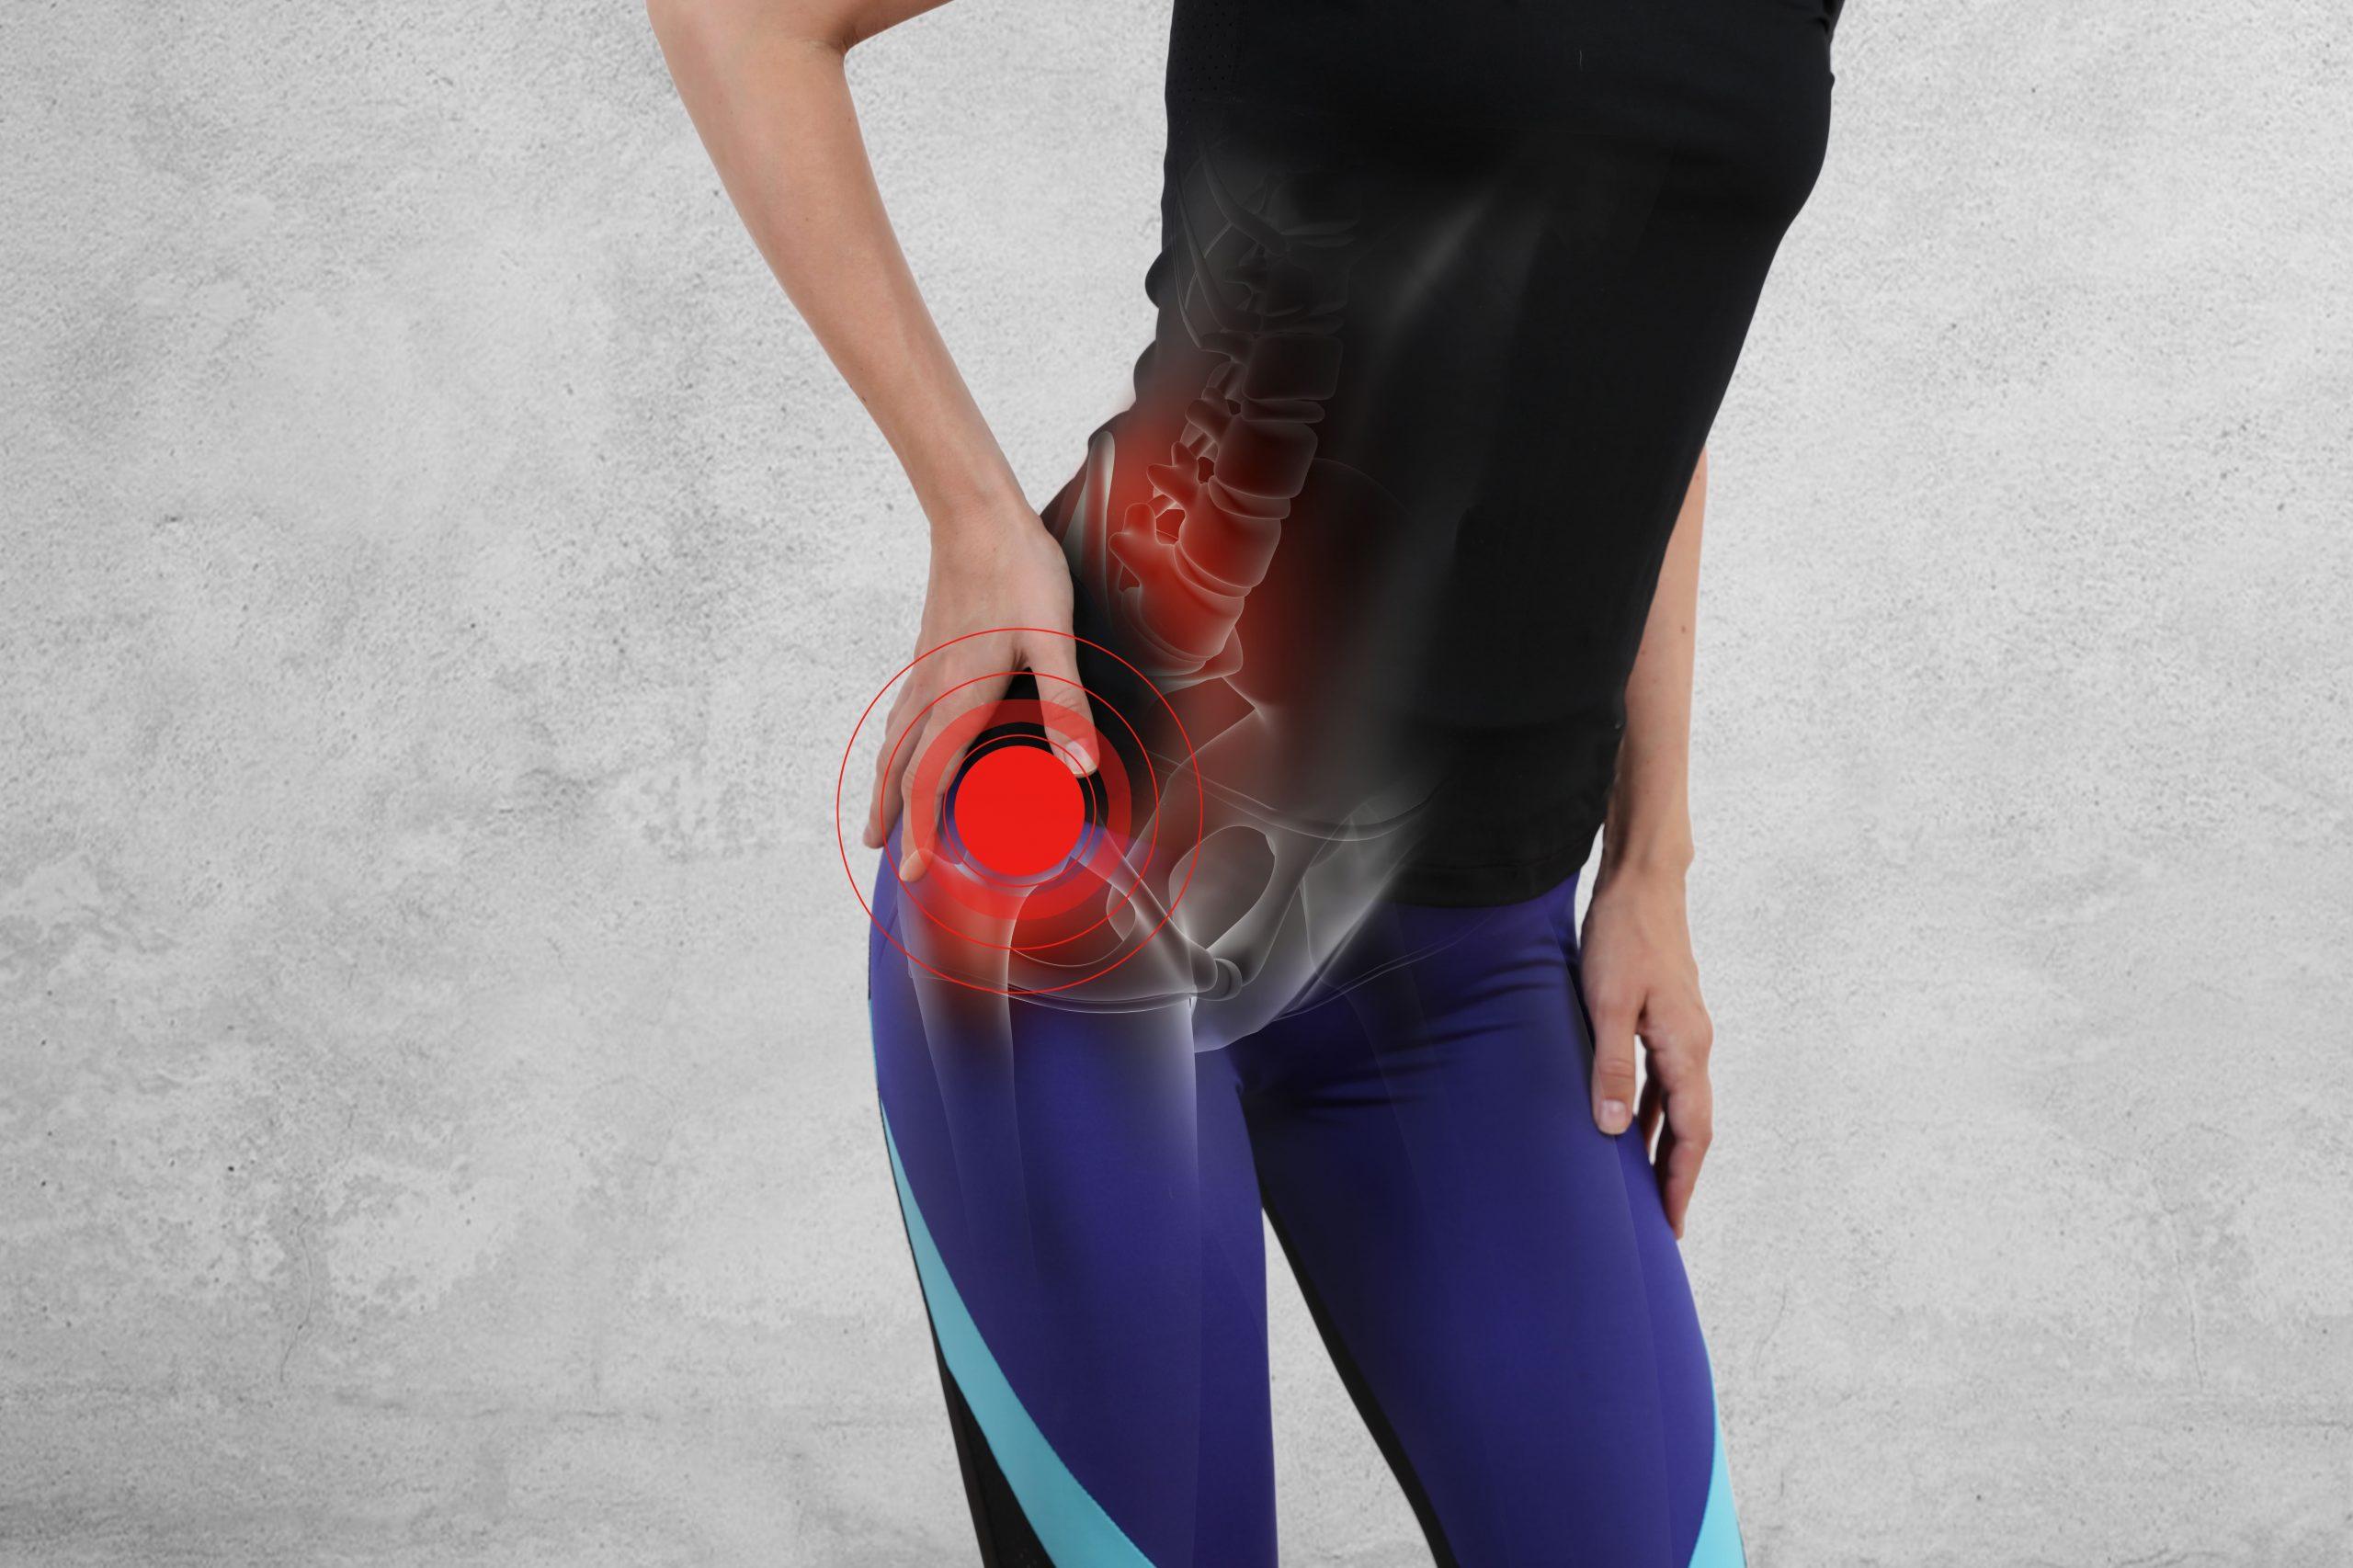 Common Hip and Pelvic Injuries